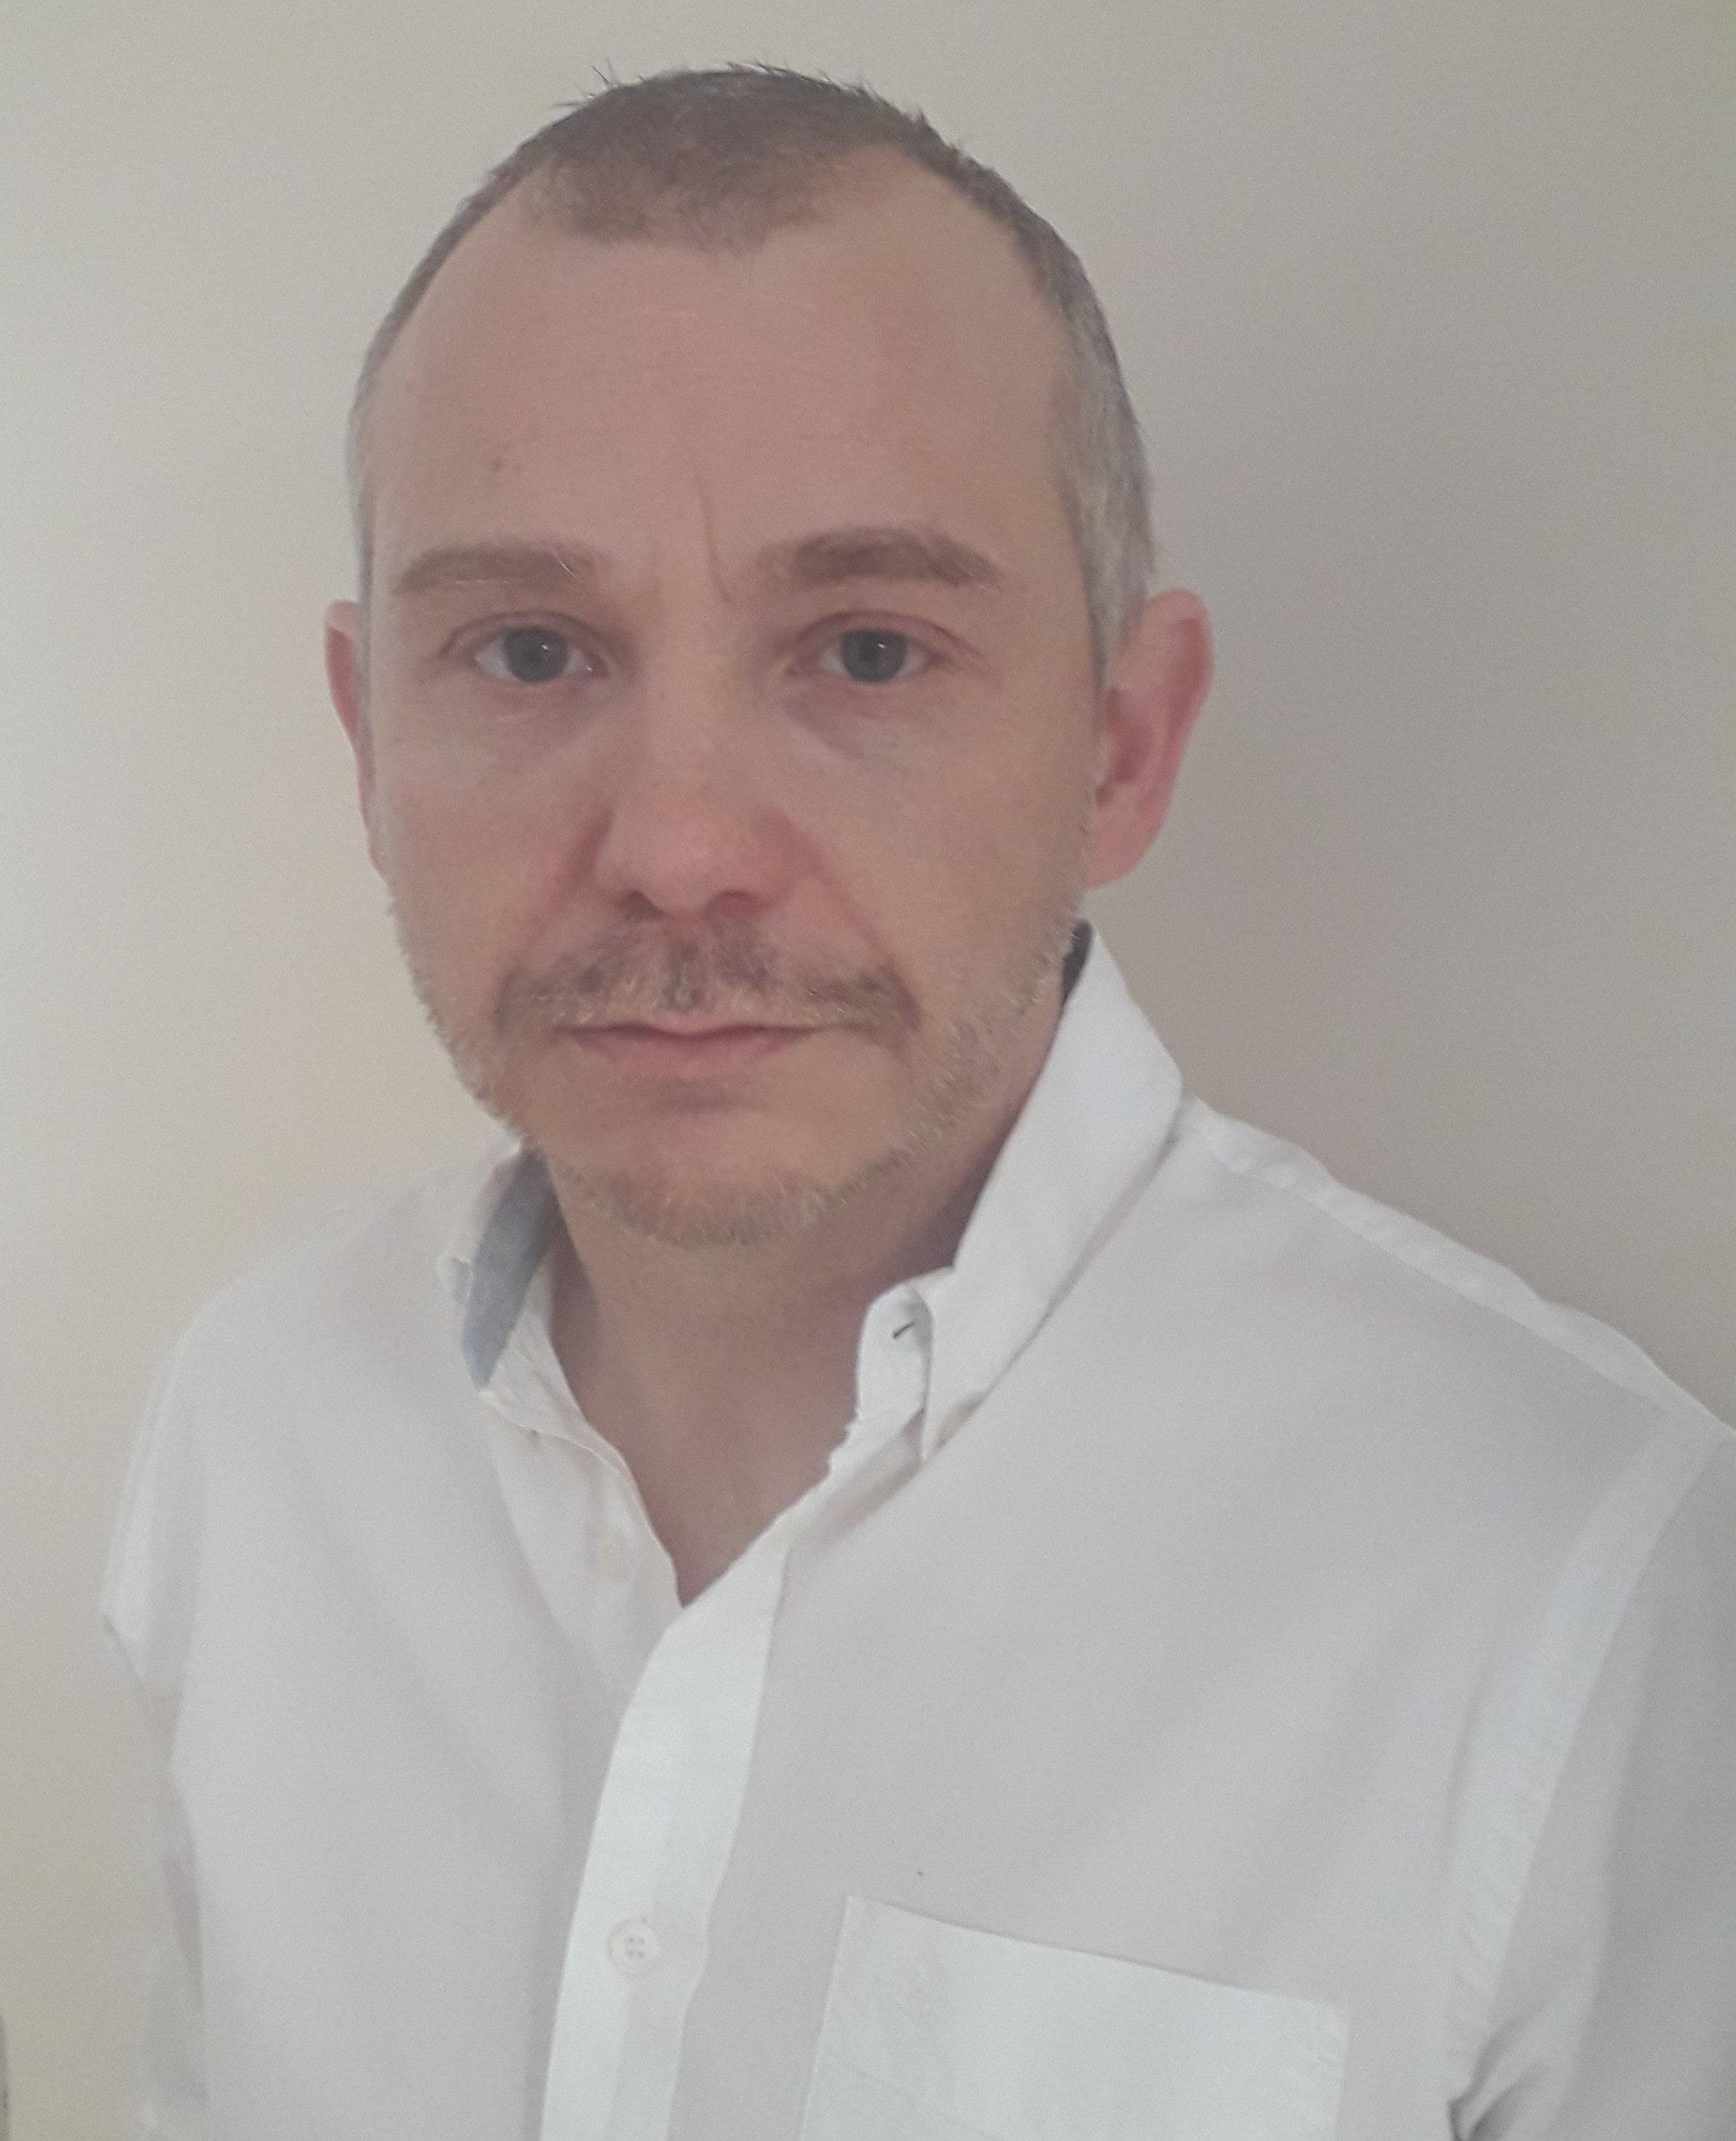 Daniel Navia